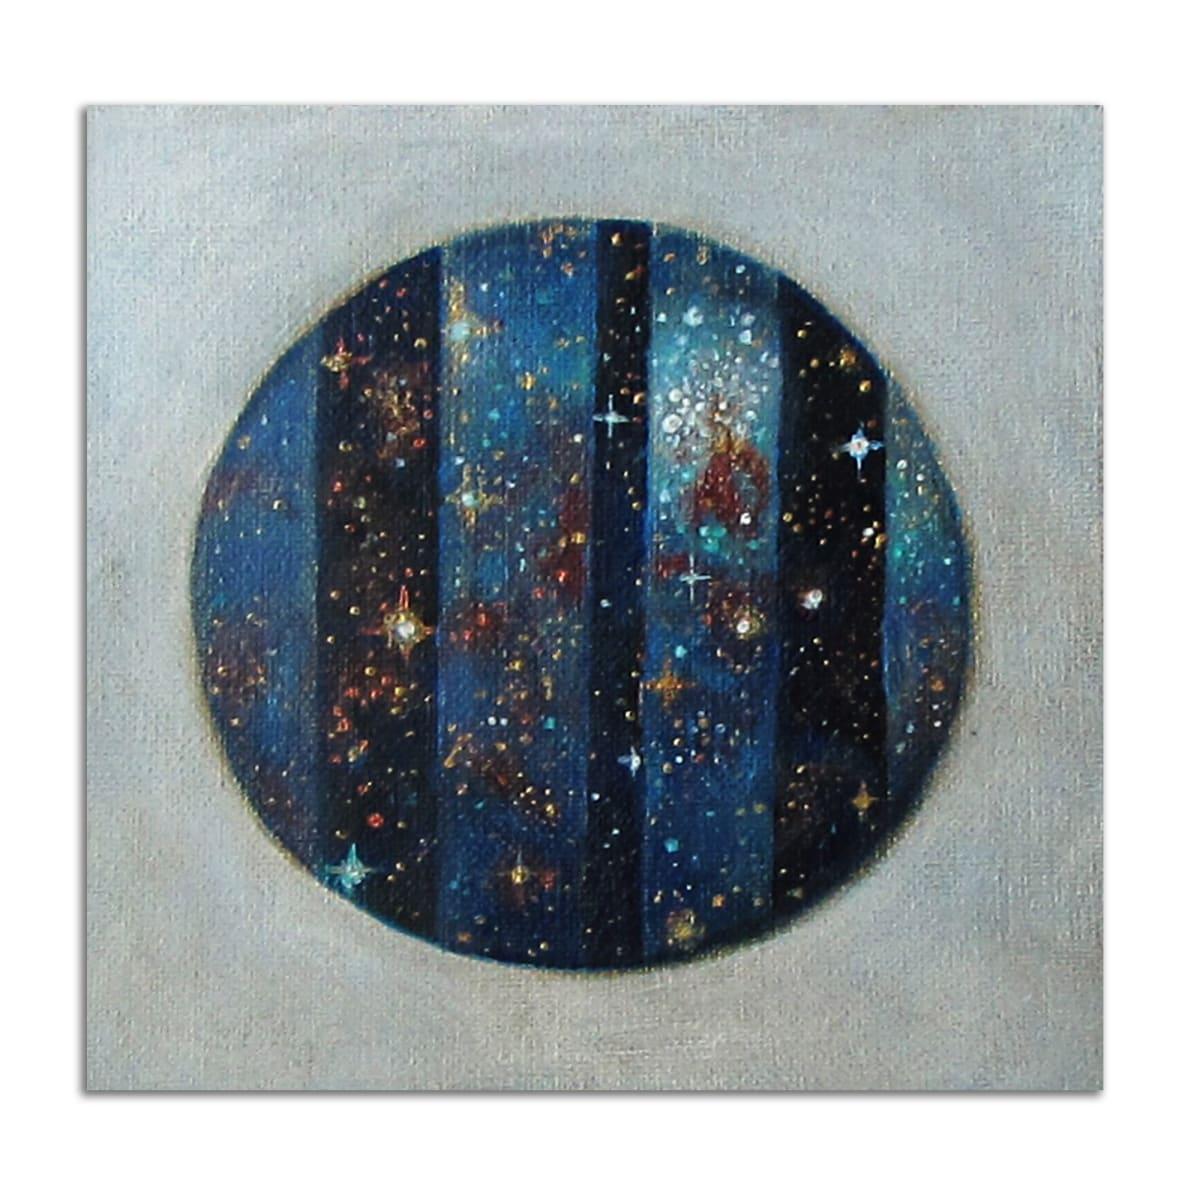 17: Star Forming Regionin the LMC by Christie Snelson